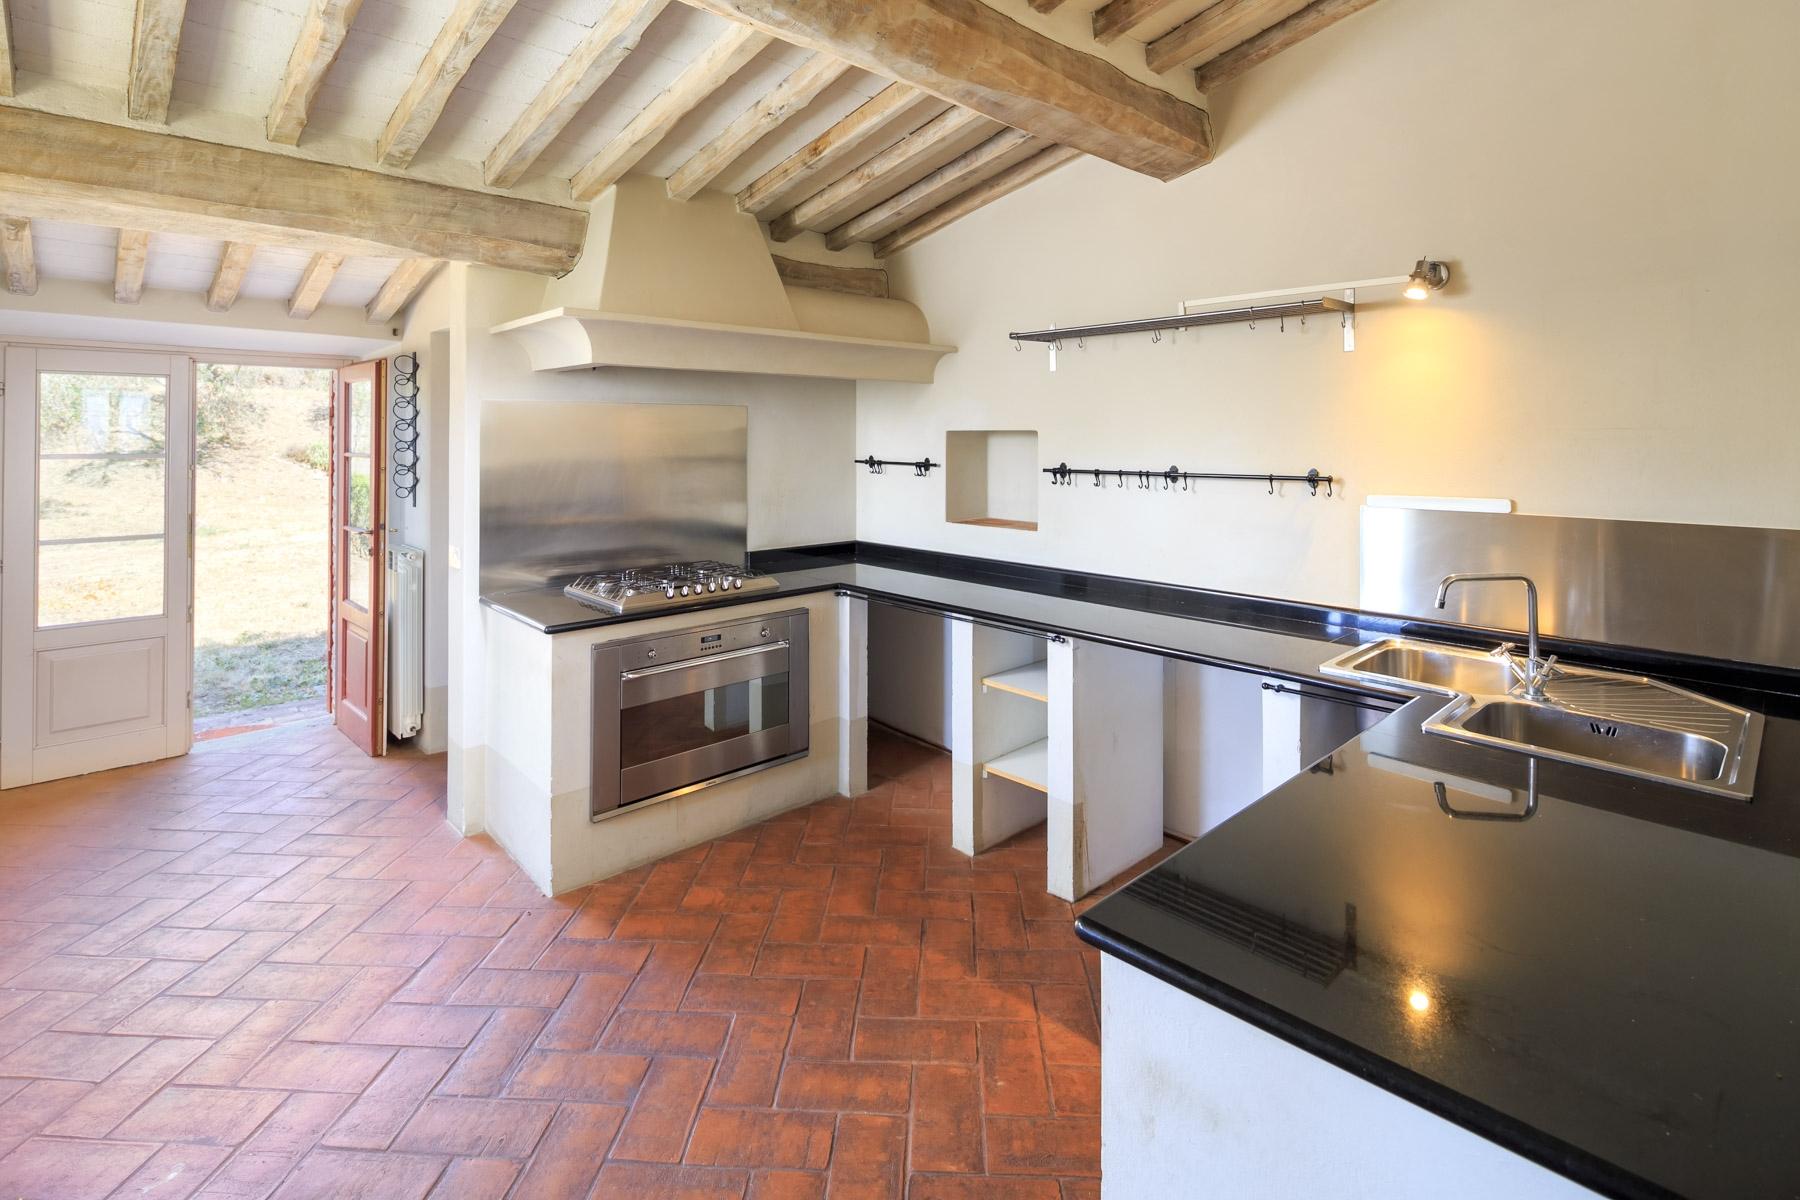 Villa in Vendita a Lucca: 5 locali, 225 mq - Foto 8